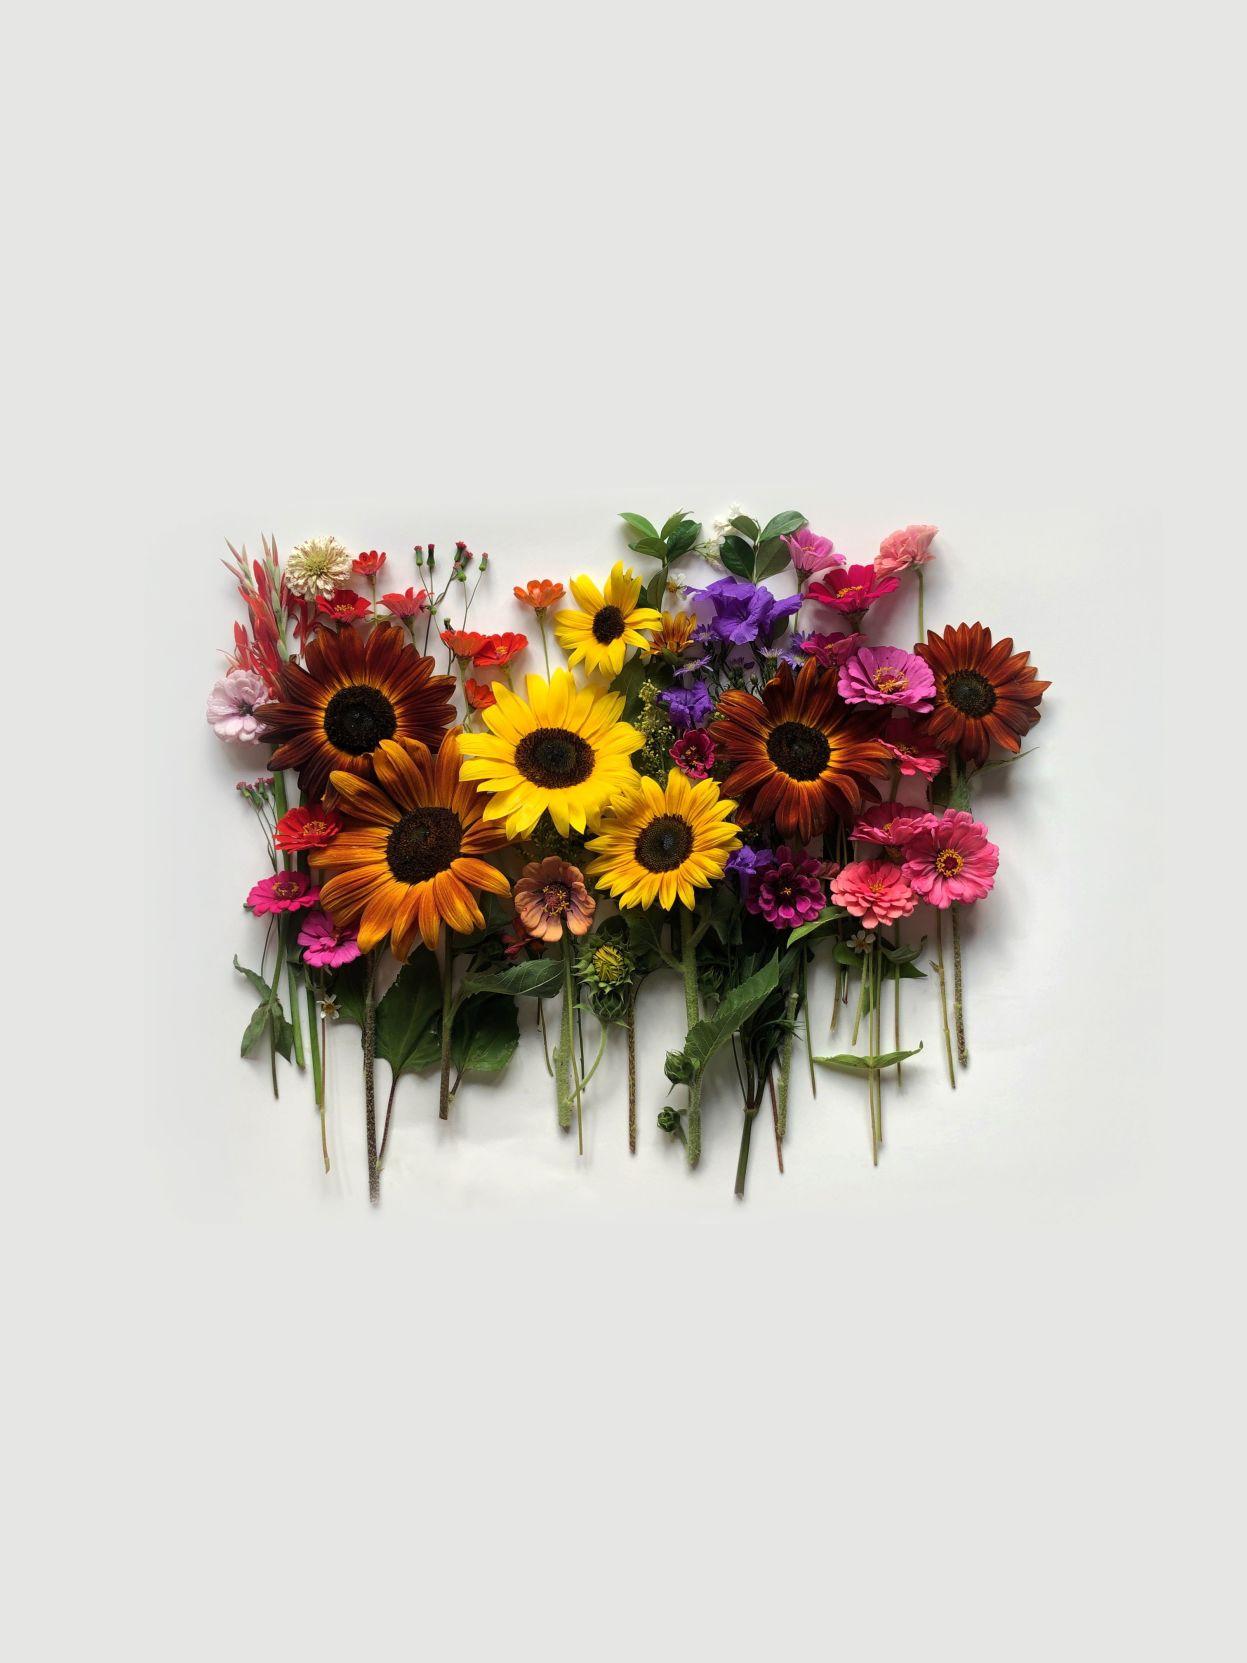 lkld_cover_flowers.psd